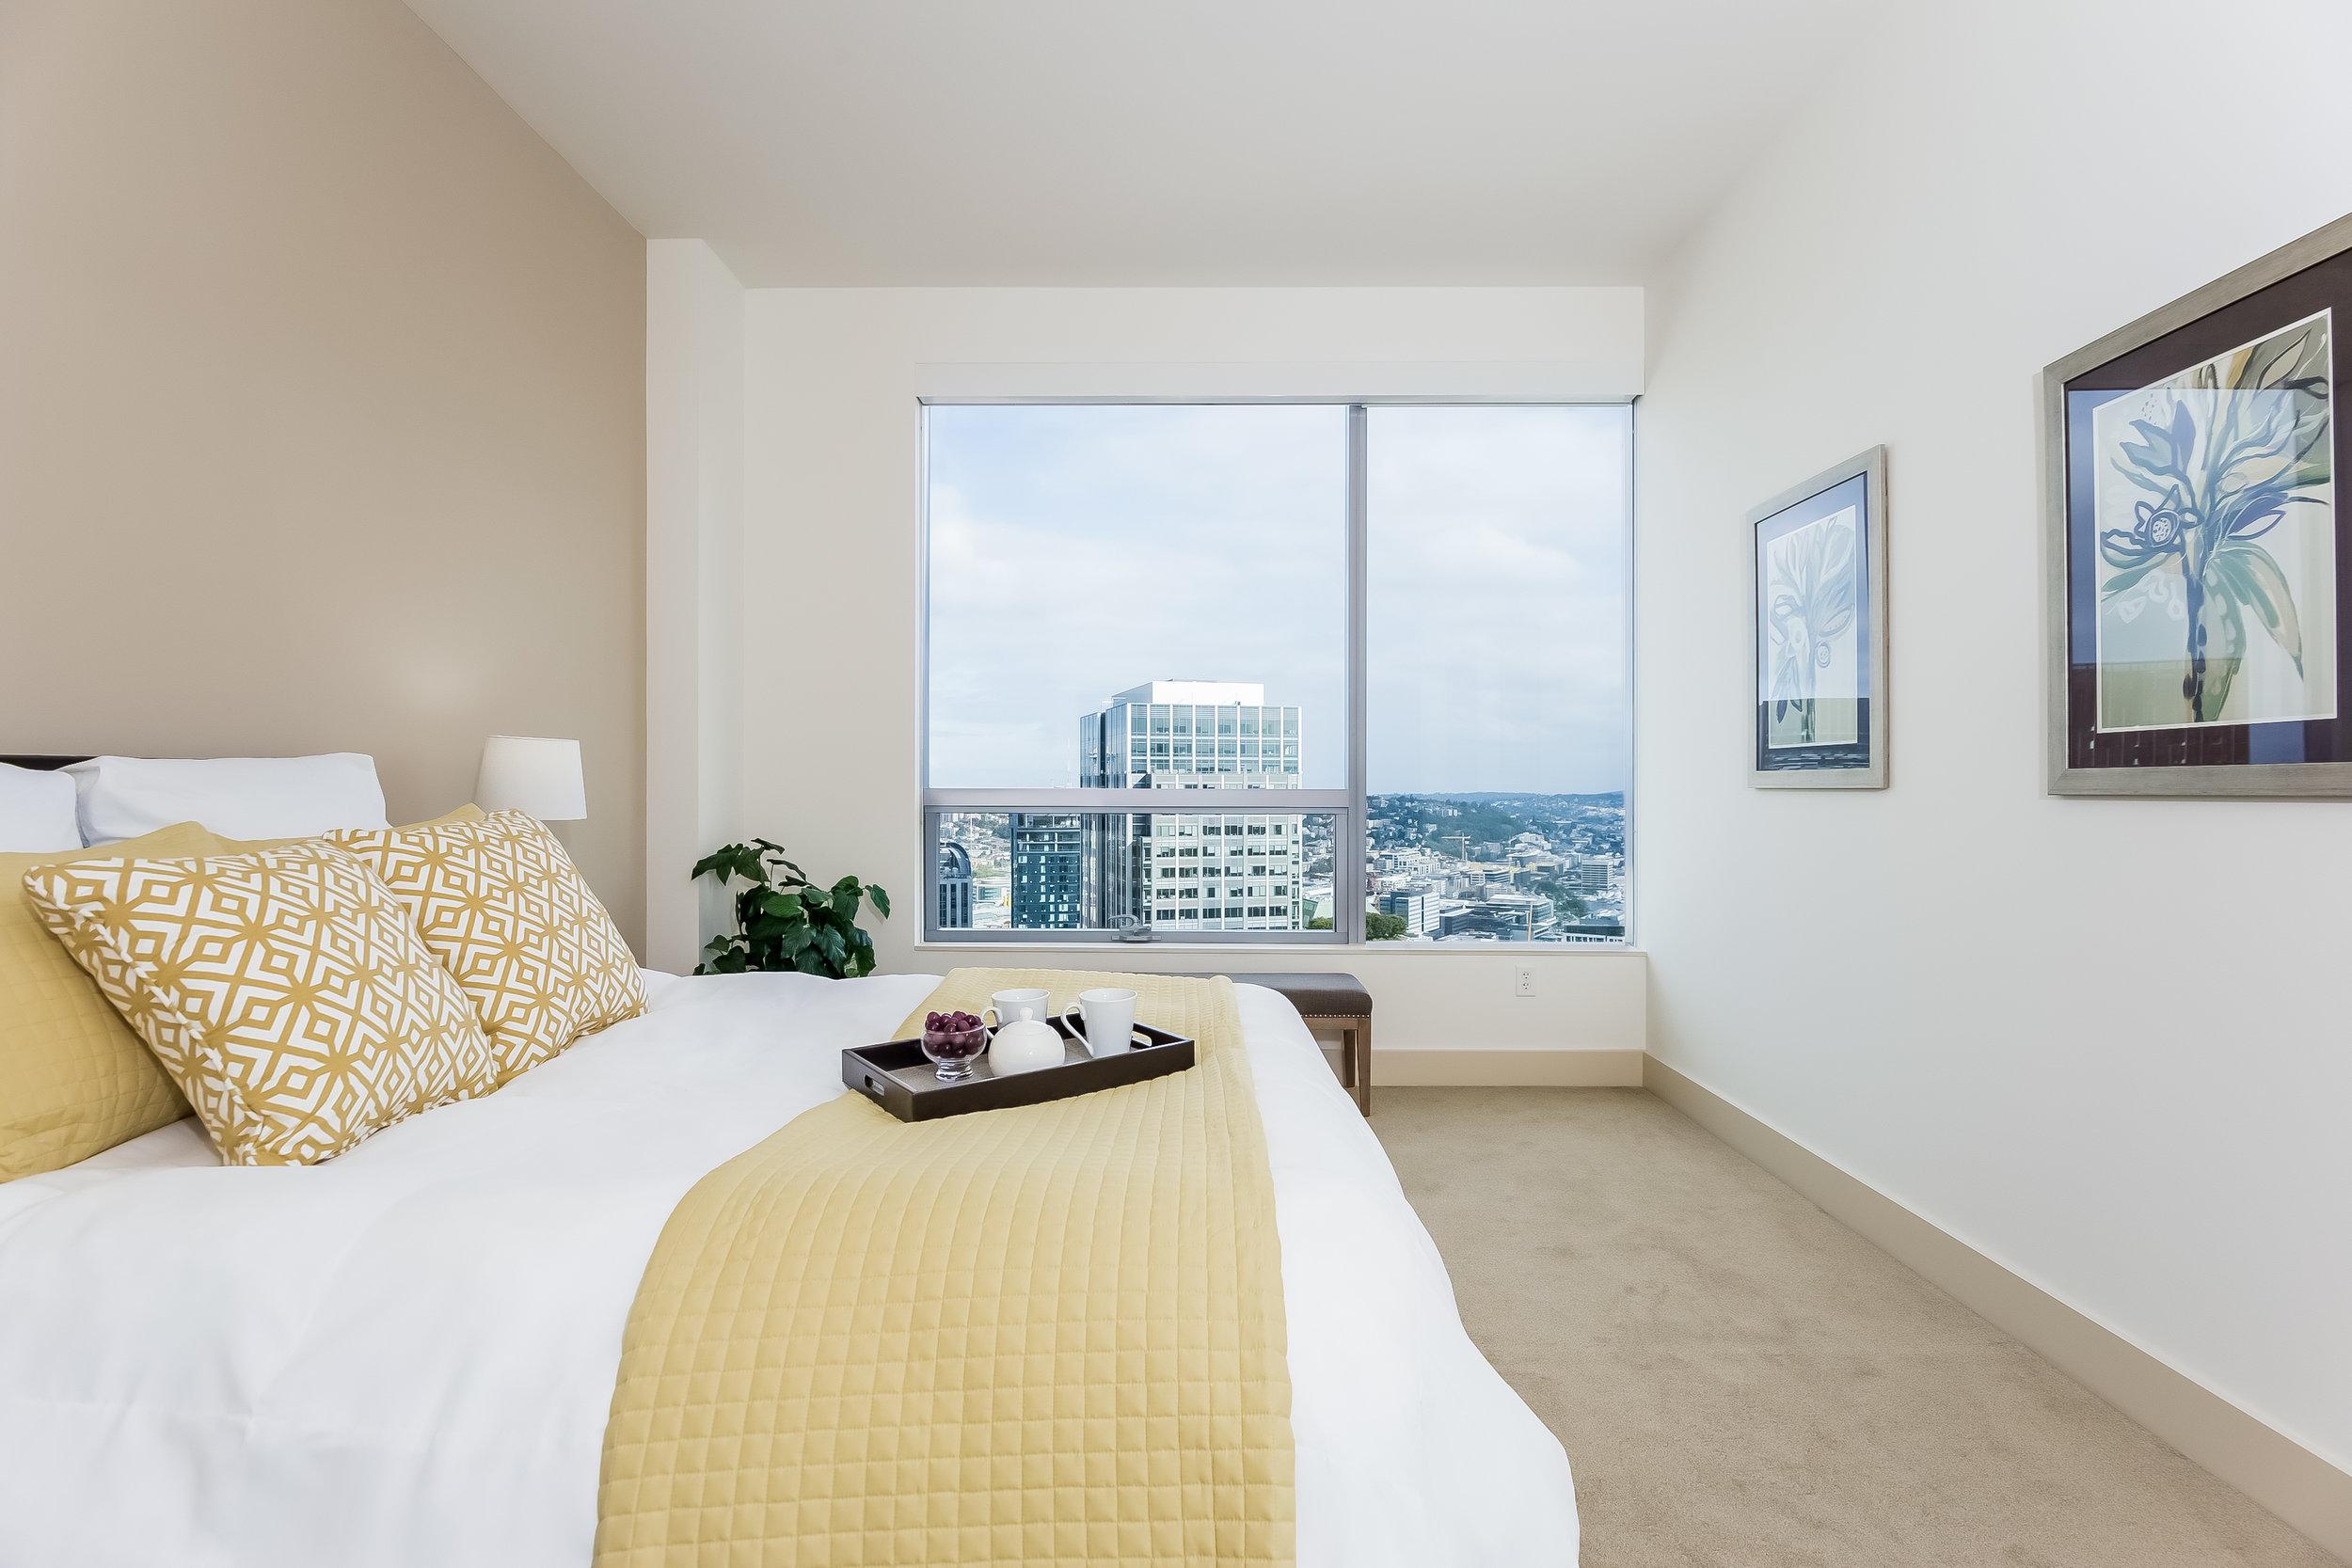 031-Master_Bedroom-3083842-large.jpg